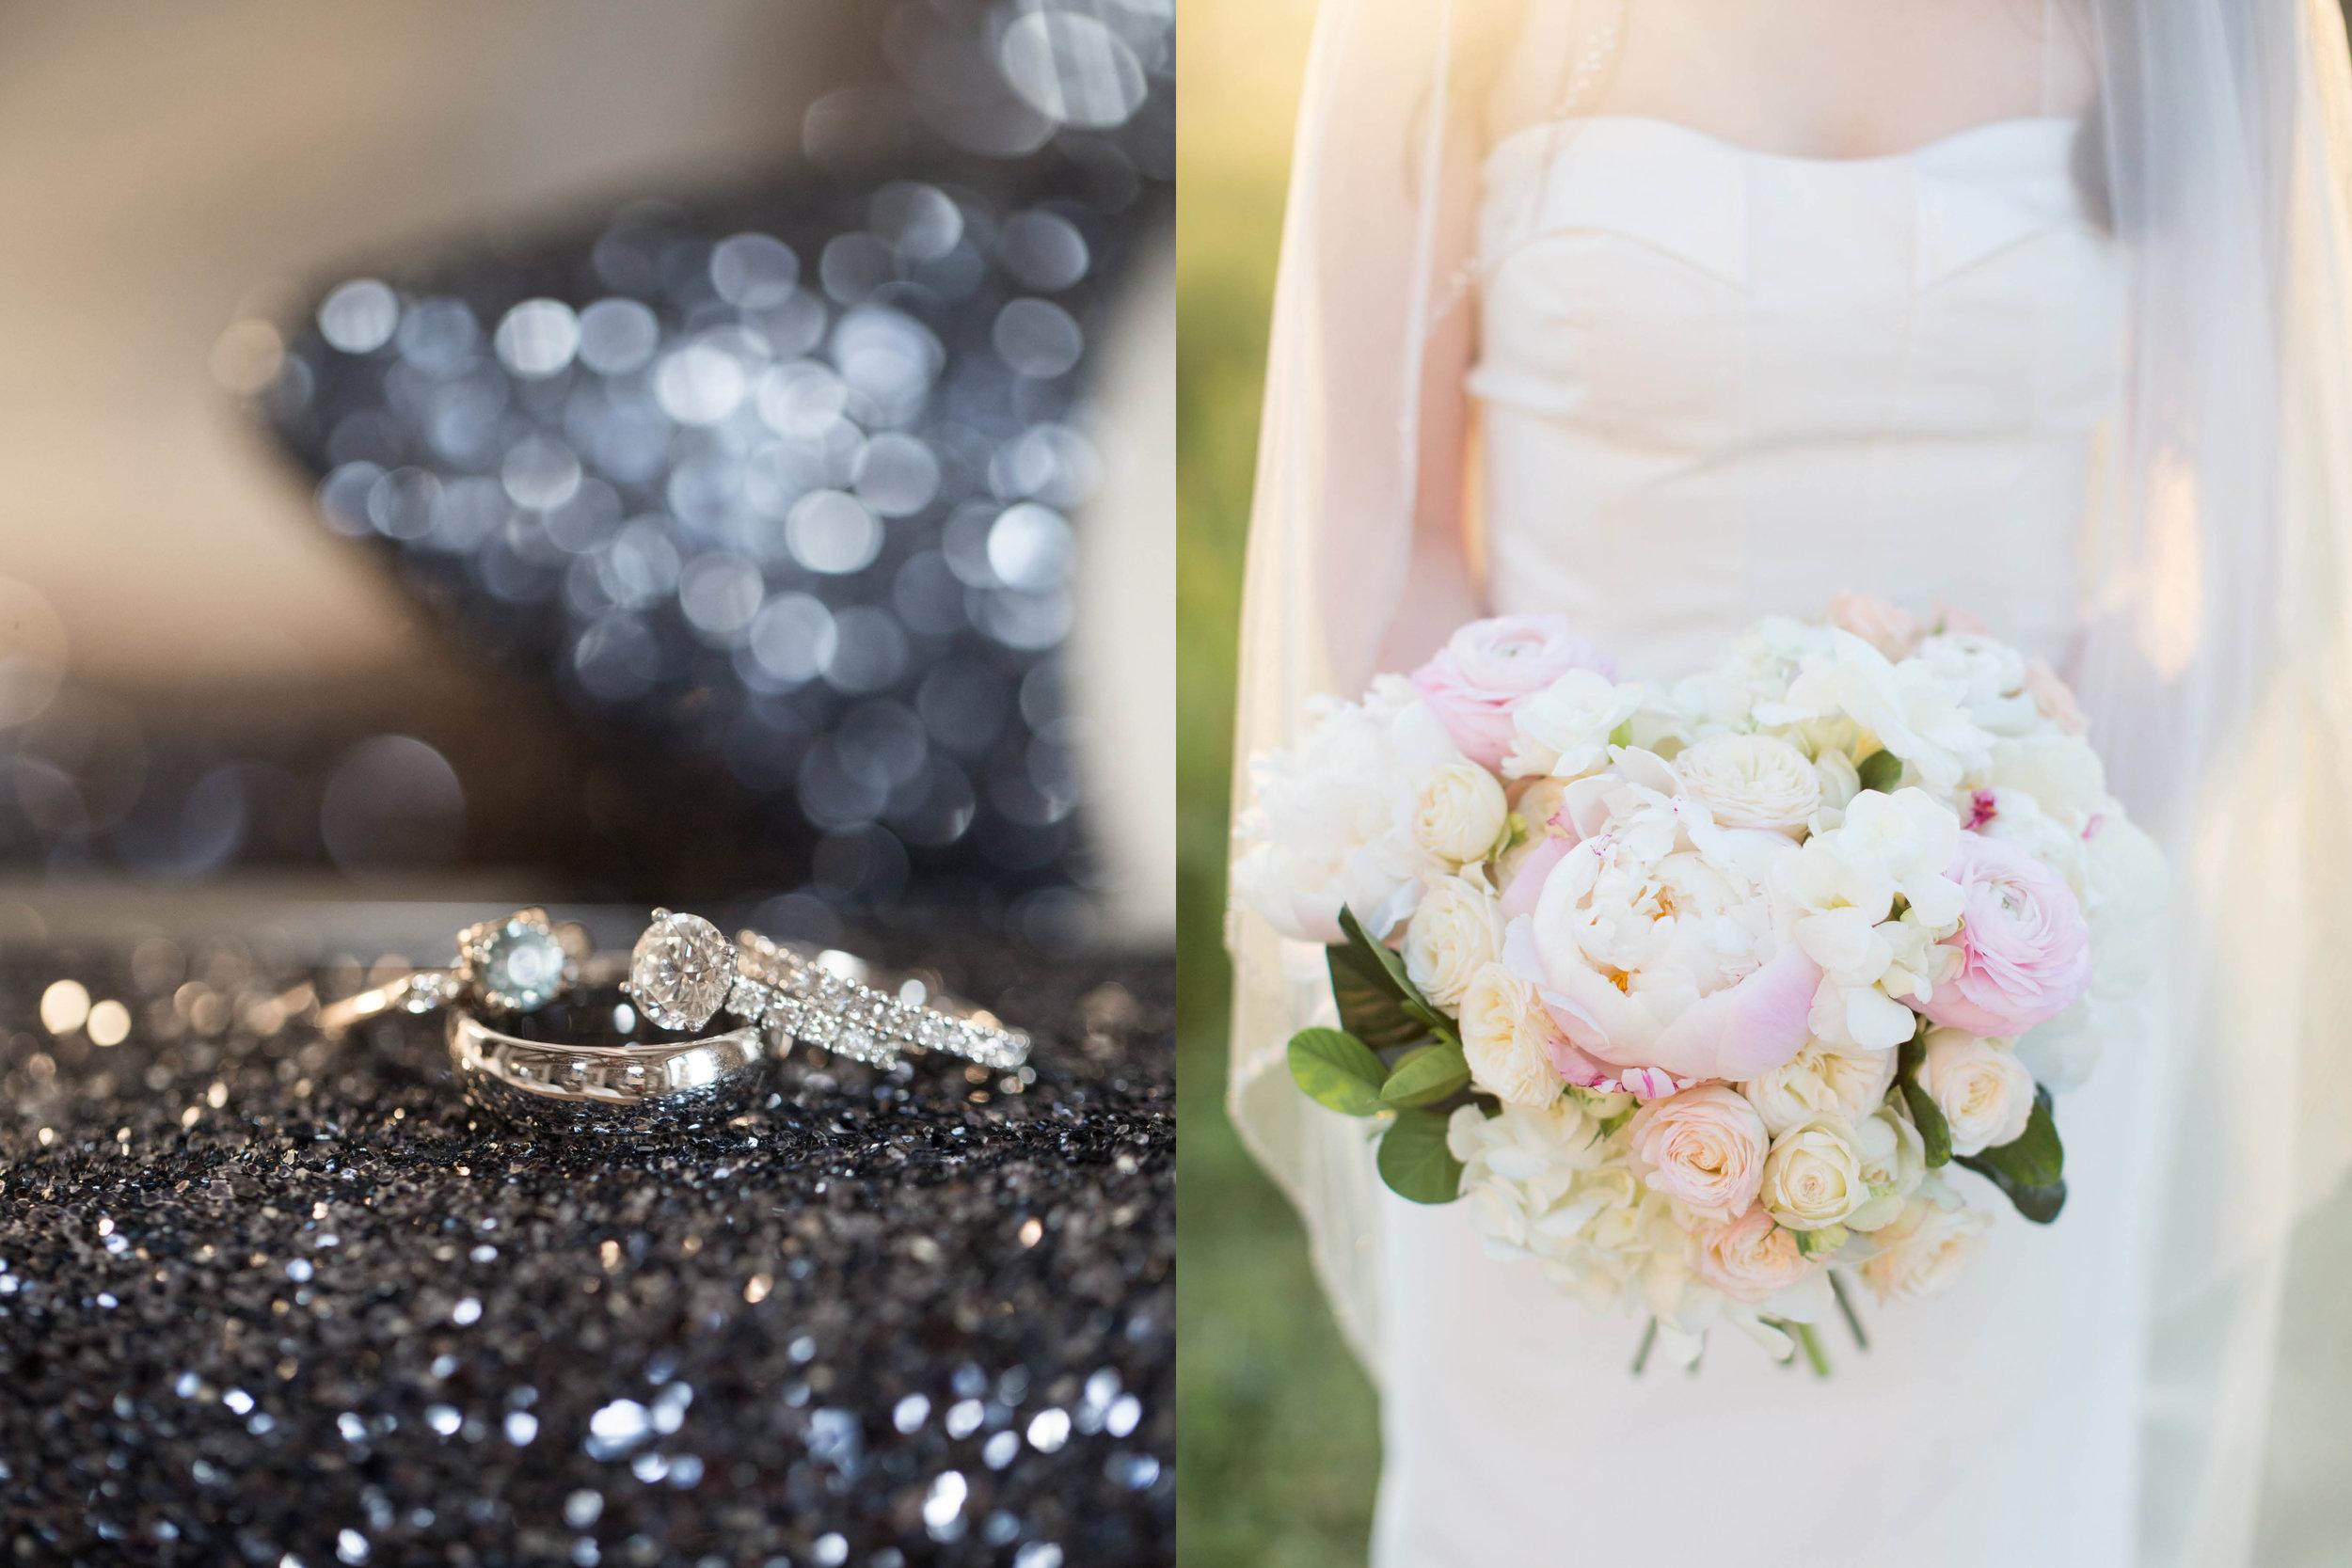 santa-barbara-elopement-wedding-planner-planning-coordinator-event-day-of-sunstone-winery-villa-tuscan-vineyard-gold-classic-elope (5).jpg